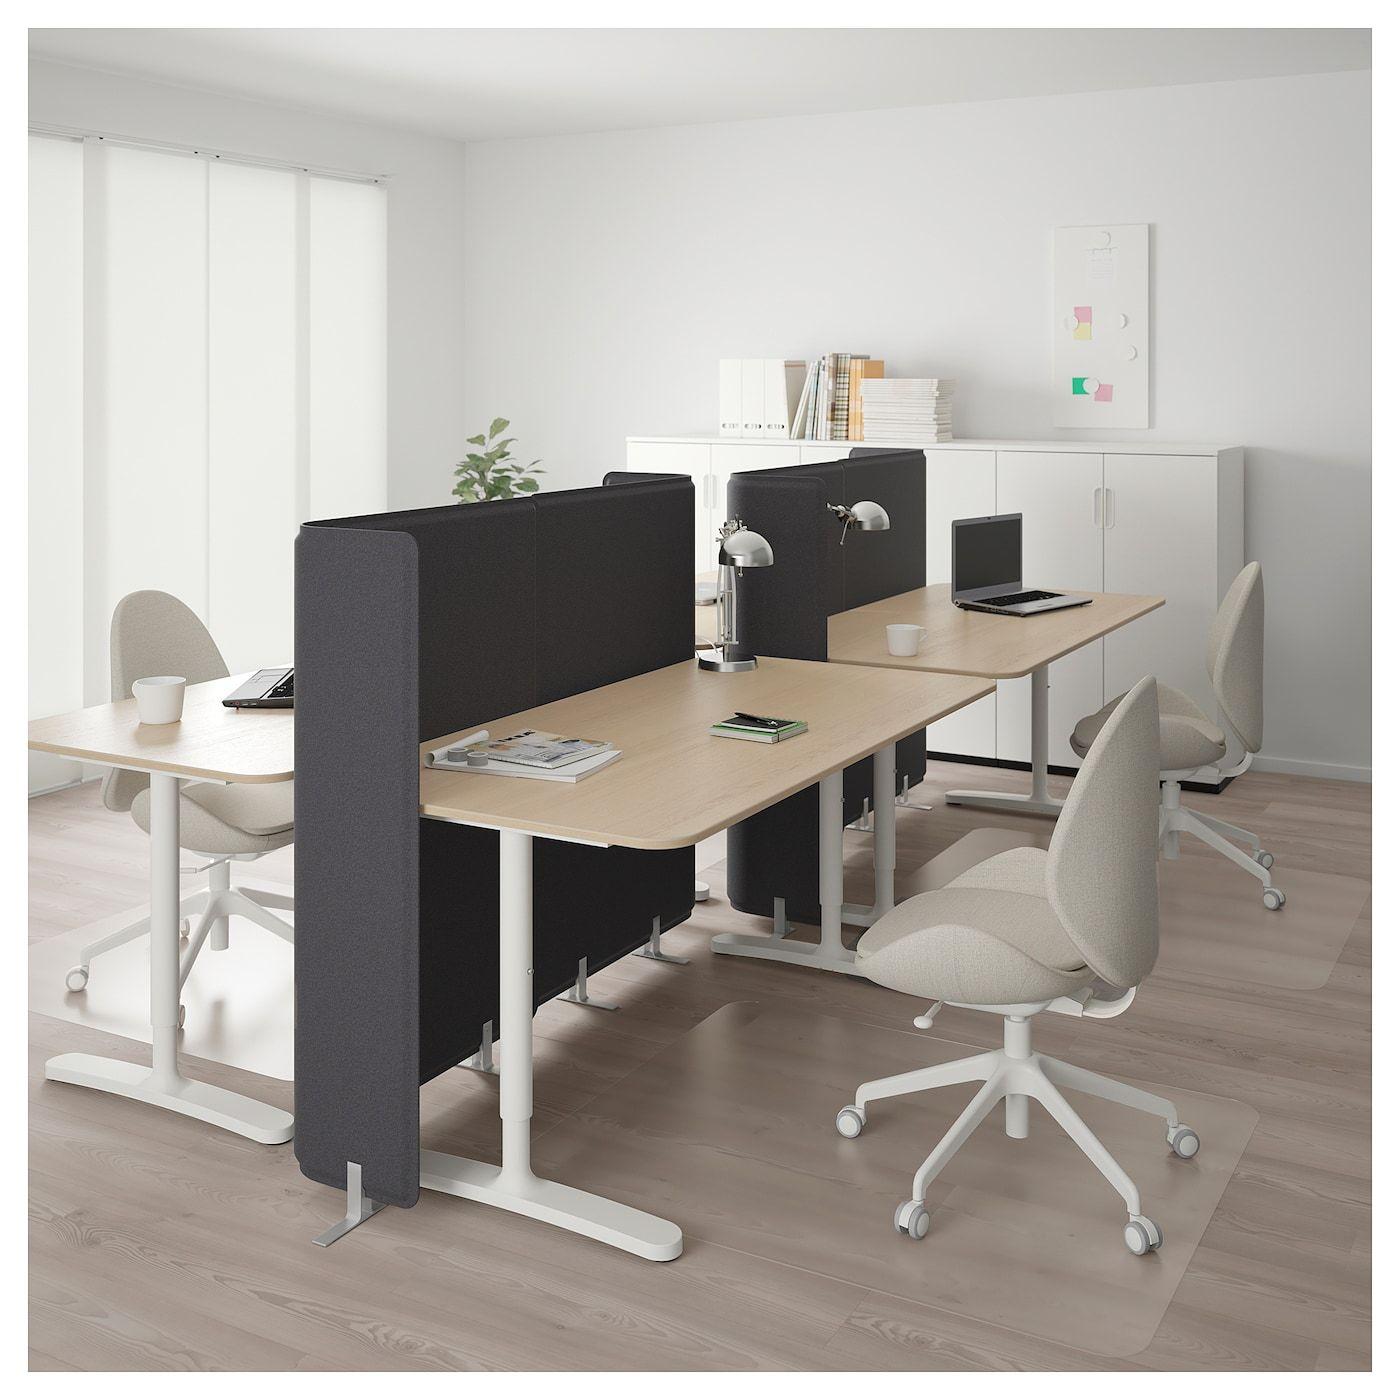 Ikea Bekant Desk With Screen White